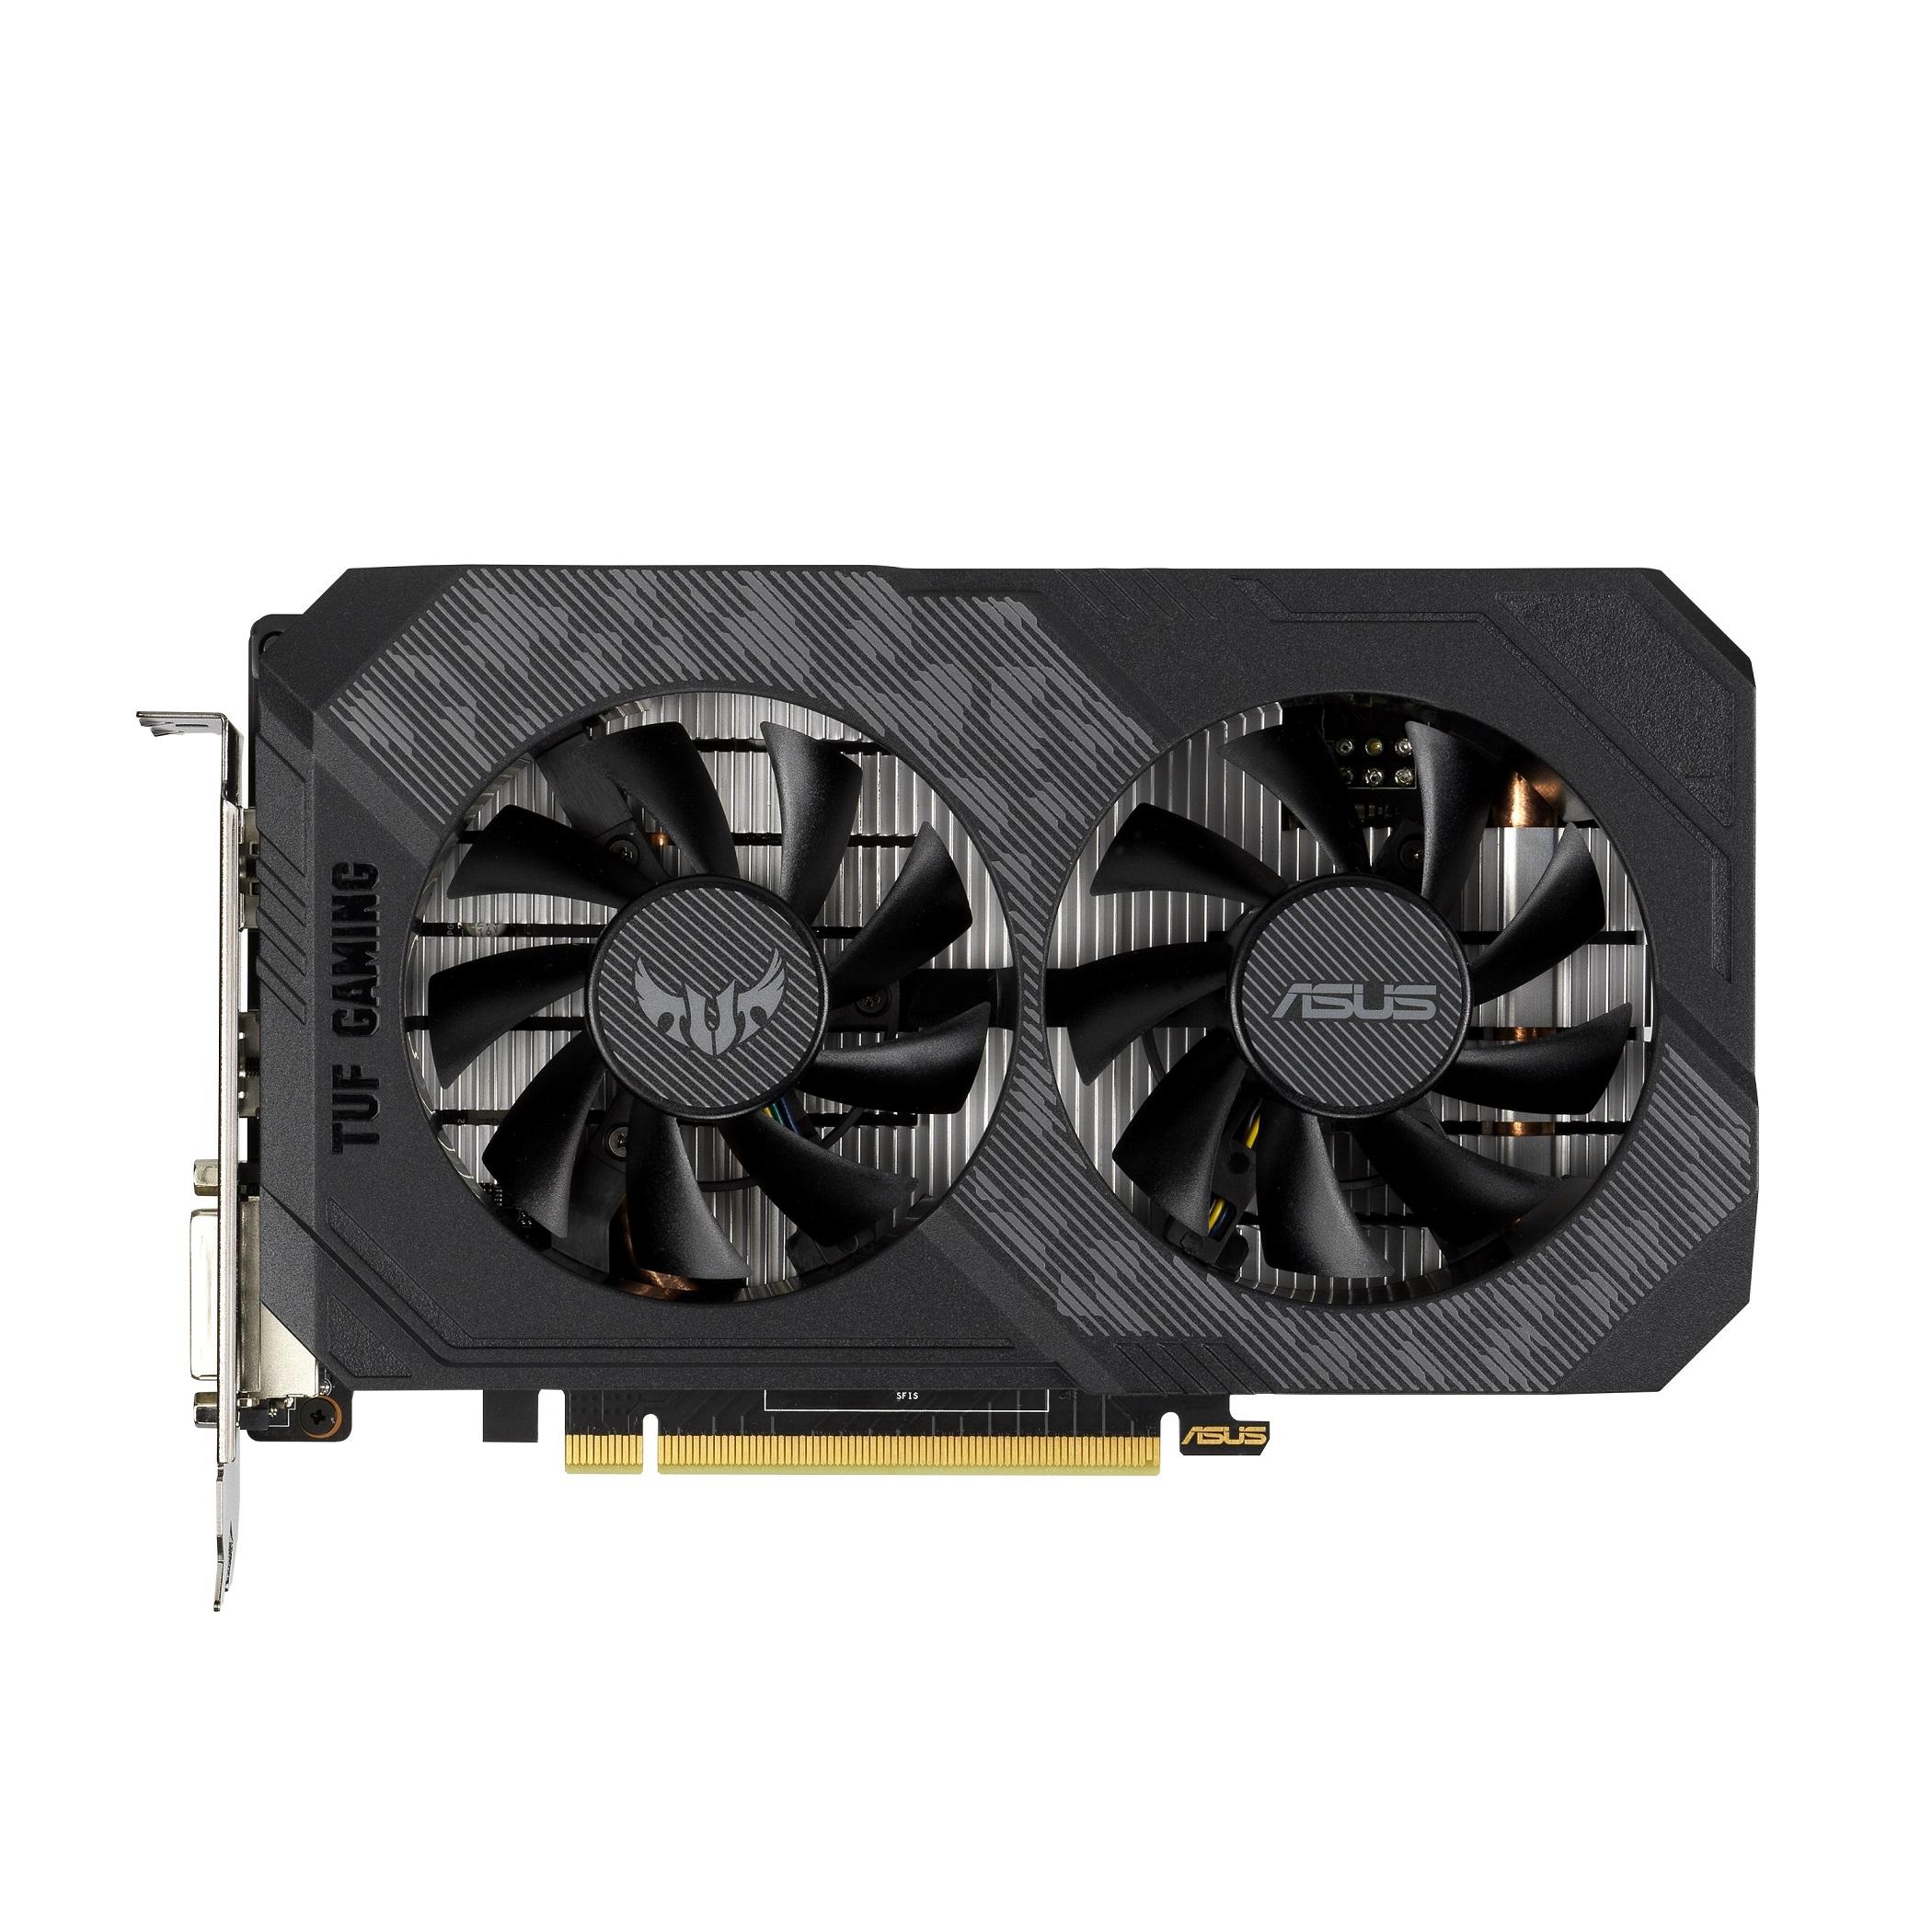 ASUS TUF Gaming GeForce GTX 1650 GDDR6顯示卡通過長達144小時的嚴格效能與壓力測試驗證,以及一系列的3DMark基準測試,能穩定發揮無懈可擊的極致性能。